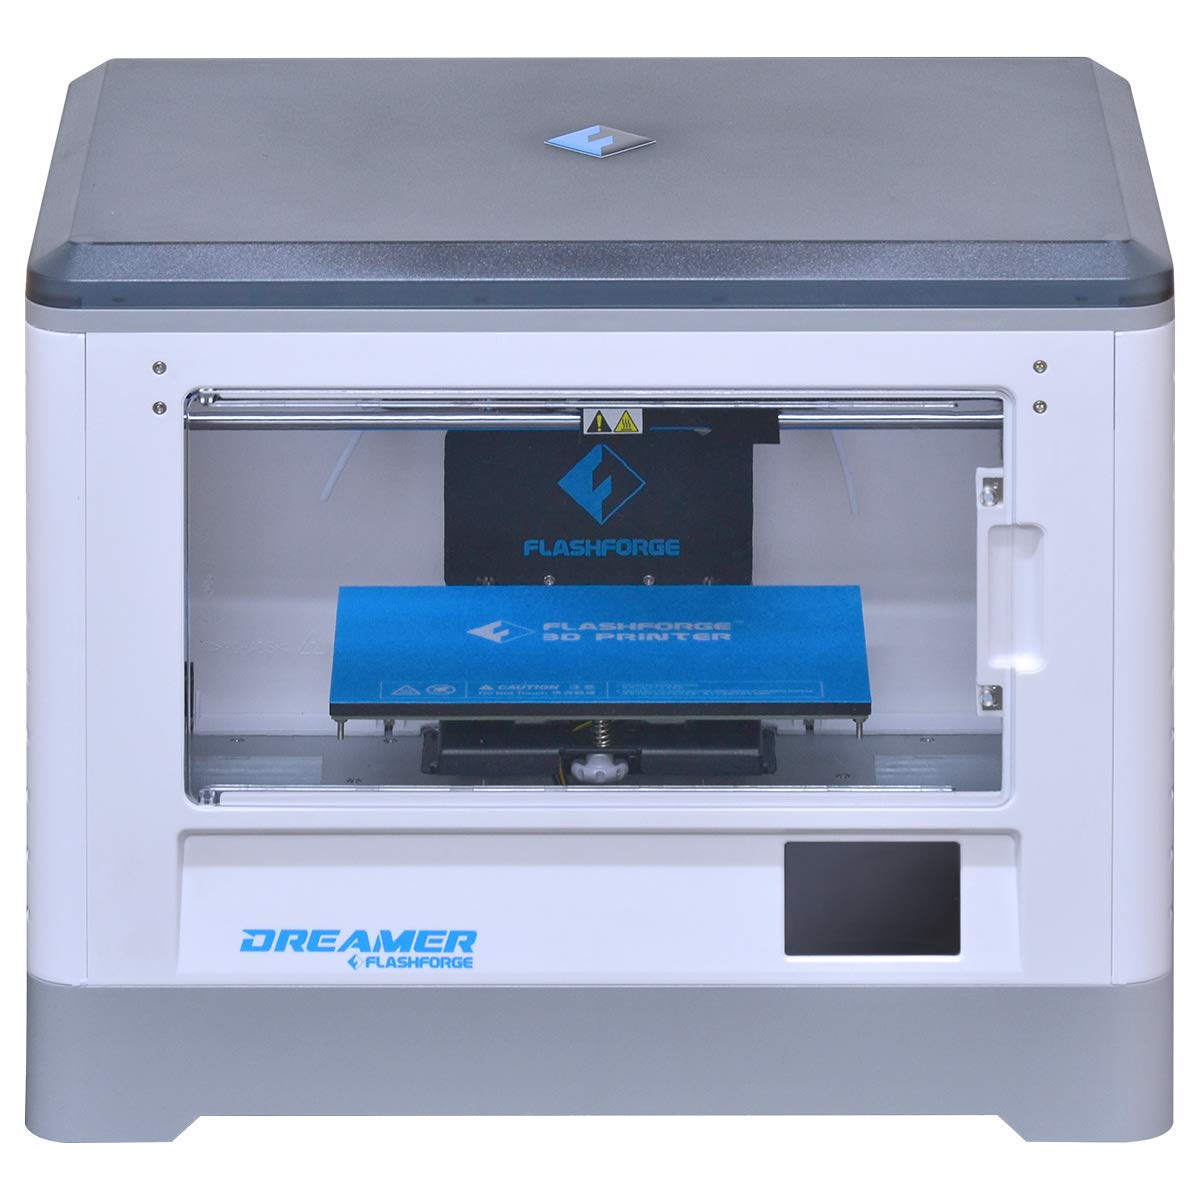 Impresora Flashforge® Dreamer Impresora 3D Dual-extrusora con ...